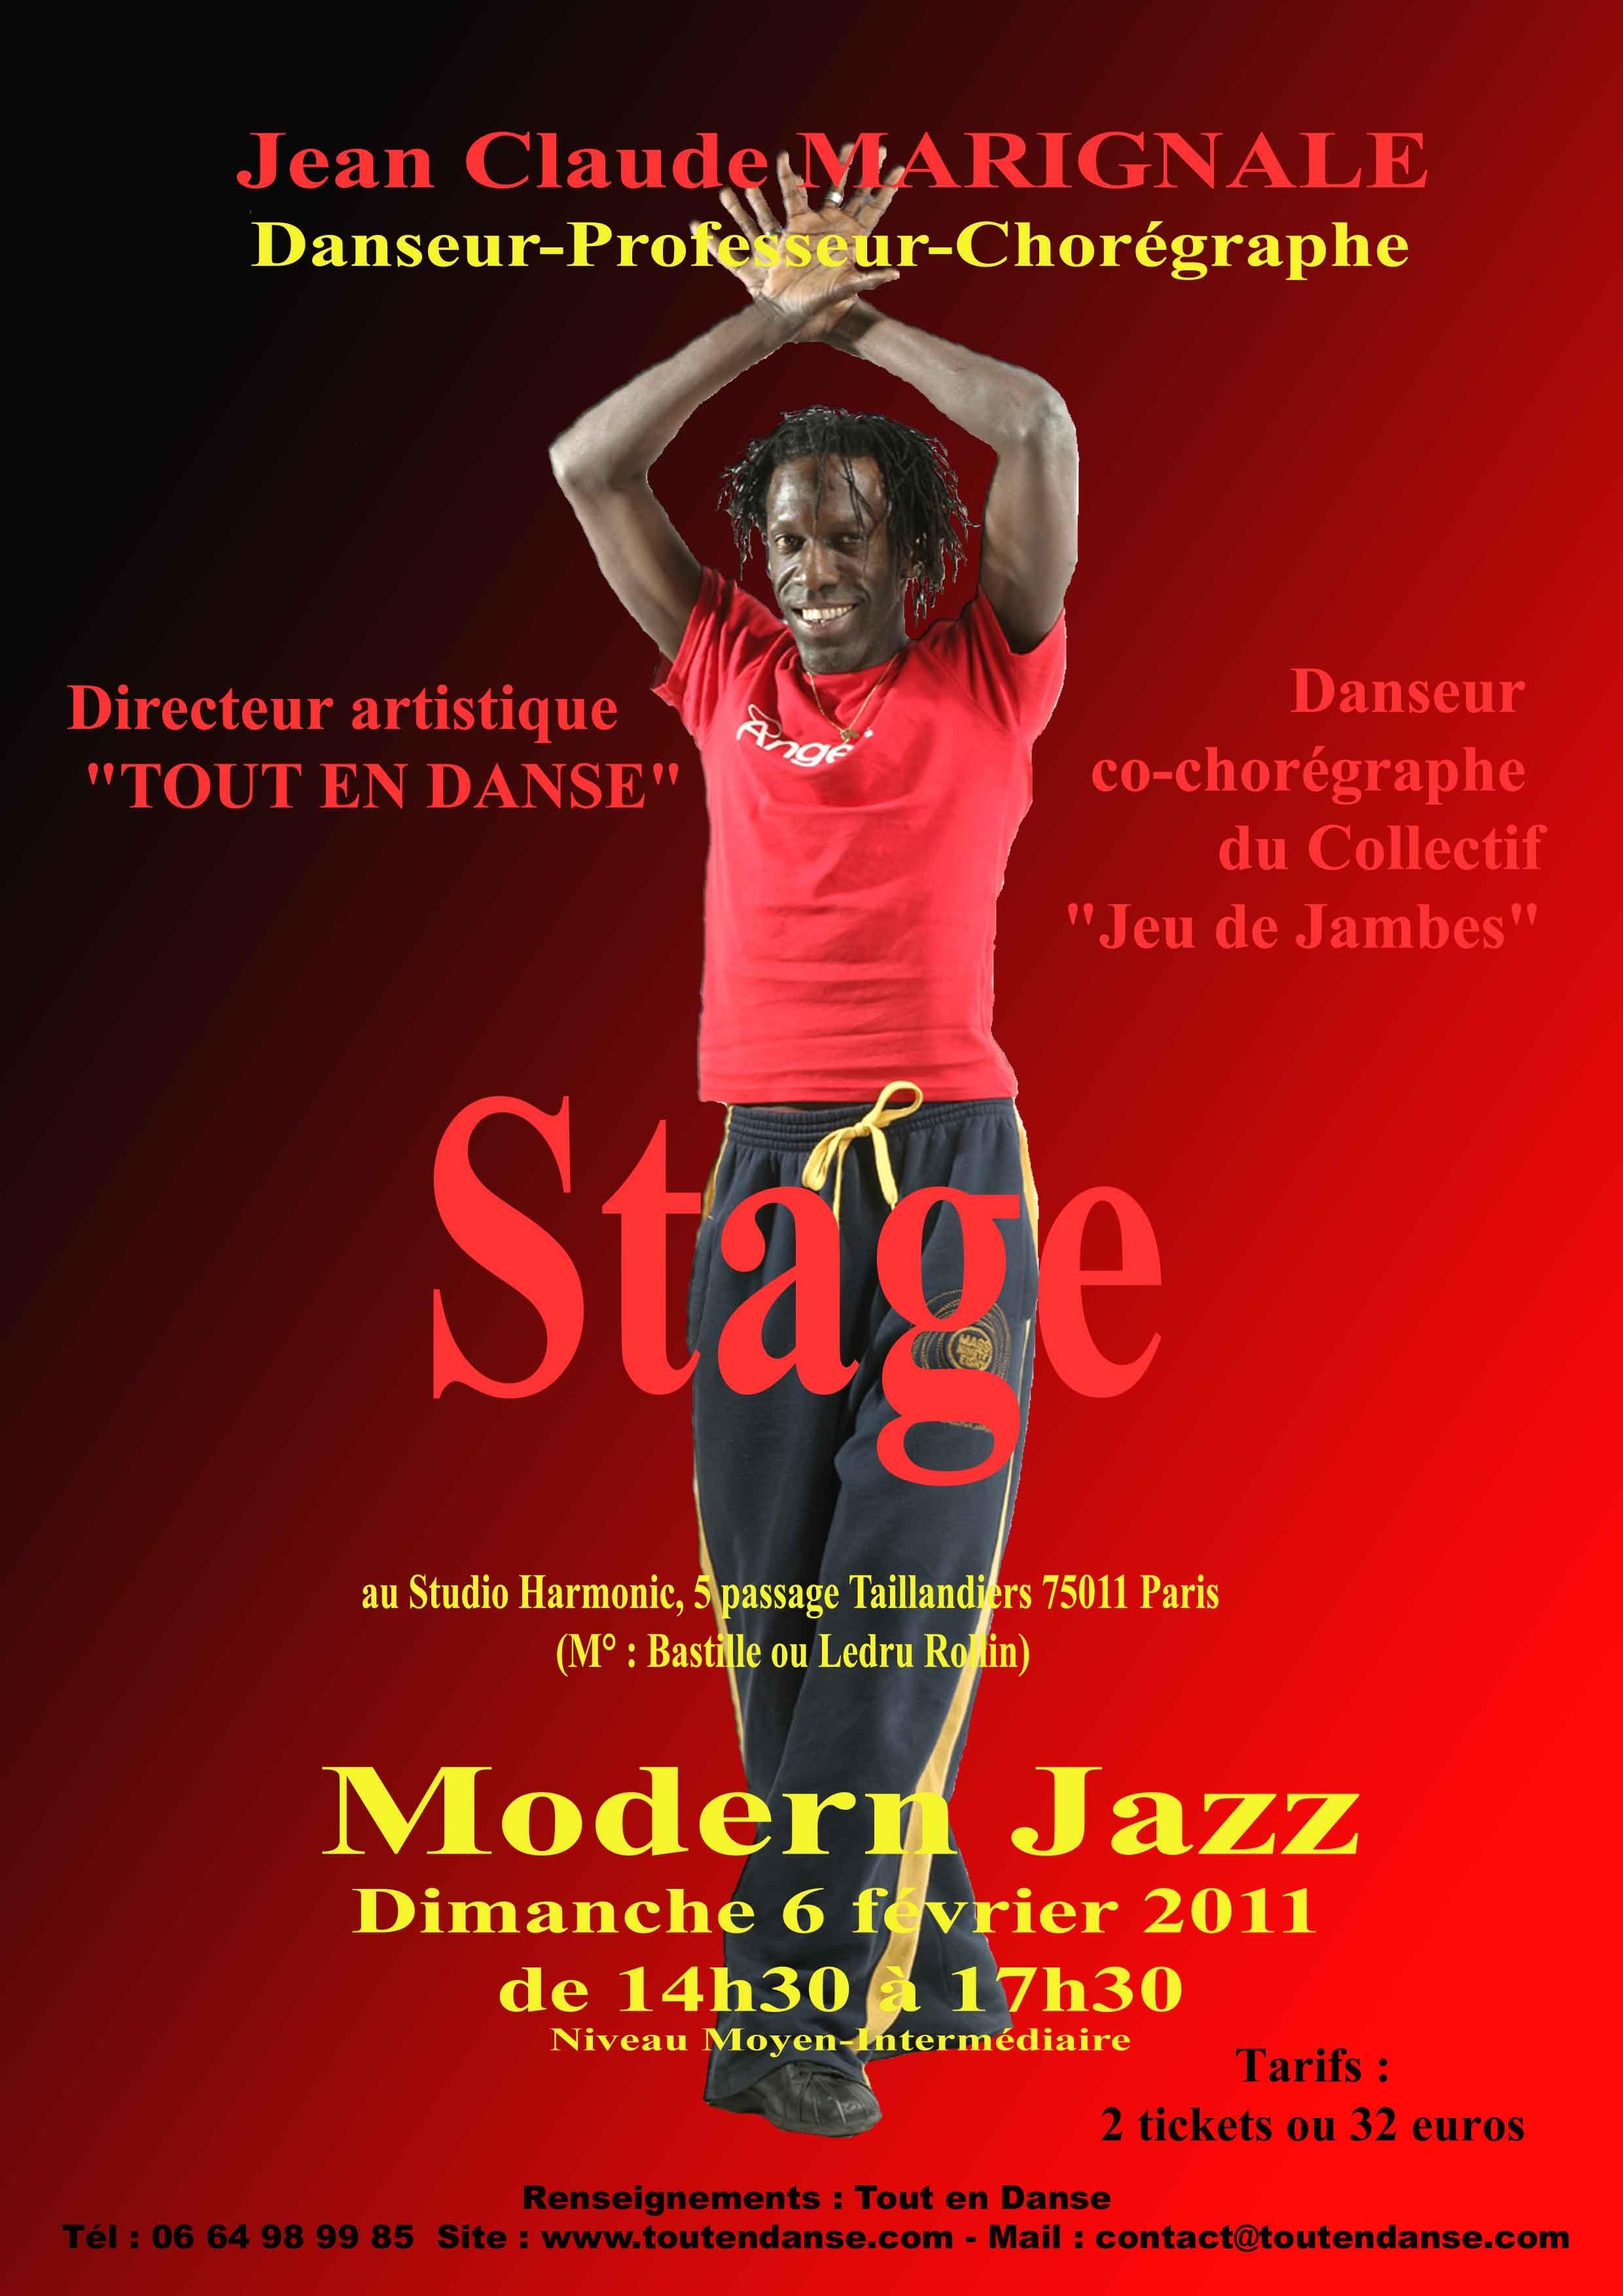 stage-harmonic-6-02-11-apl.jpg